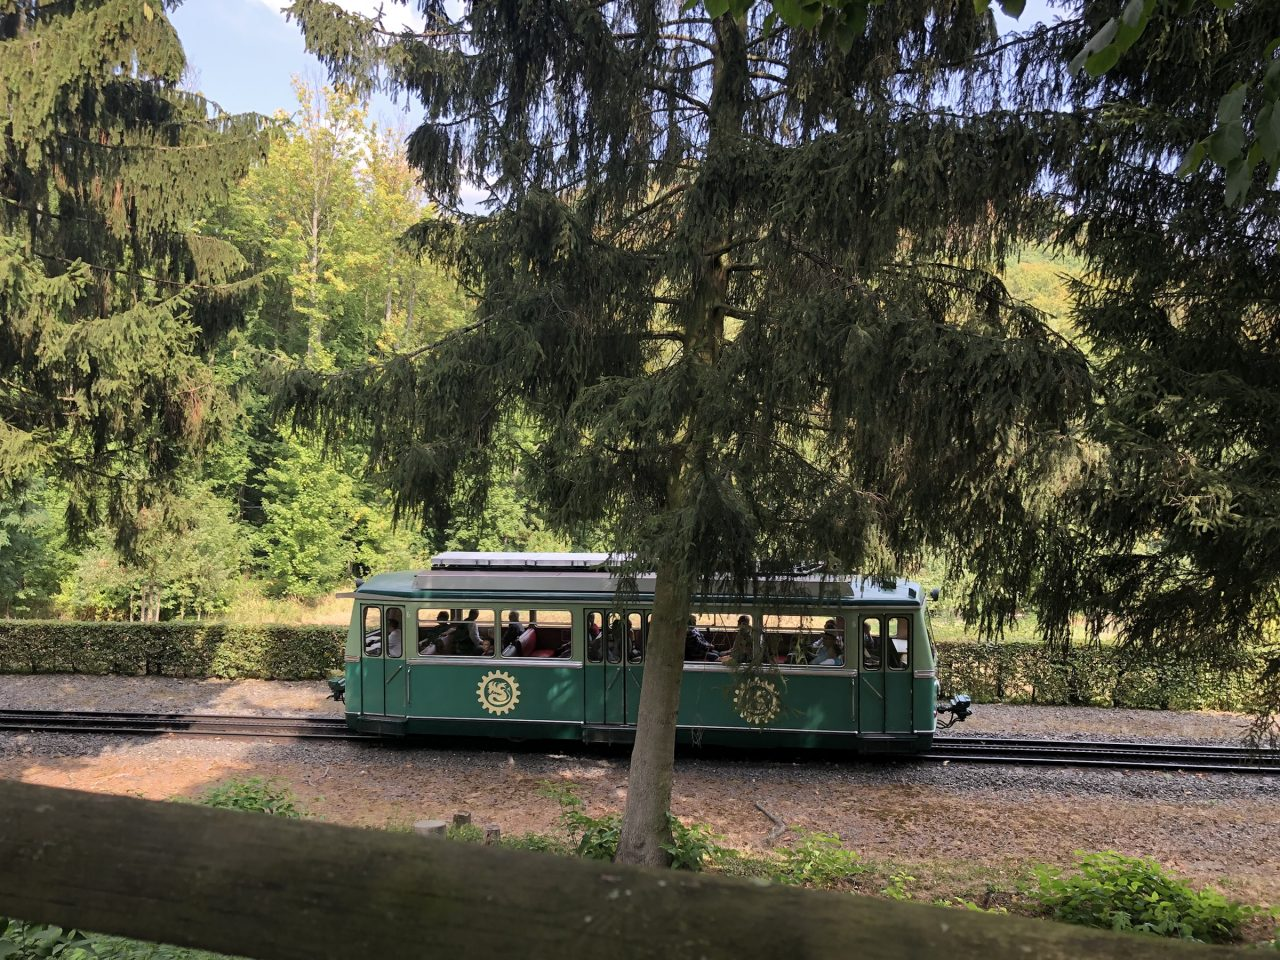 Trolley train Drachenburg Castle, Königswinter